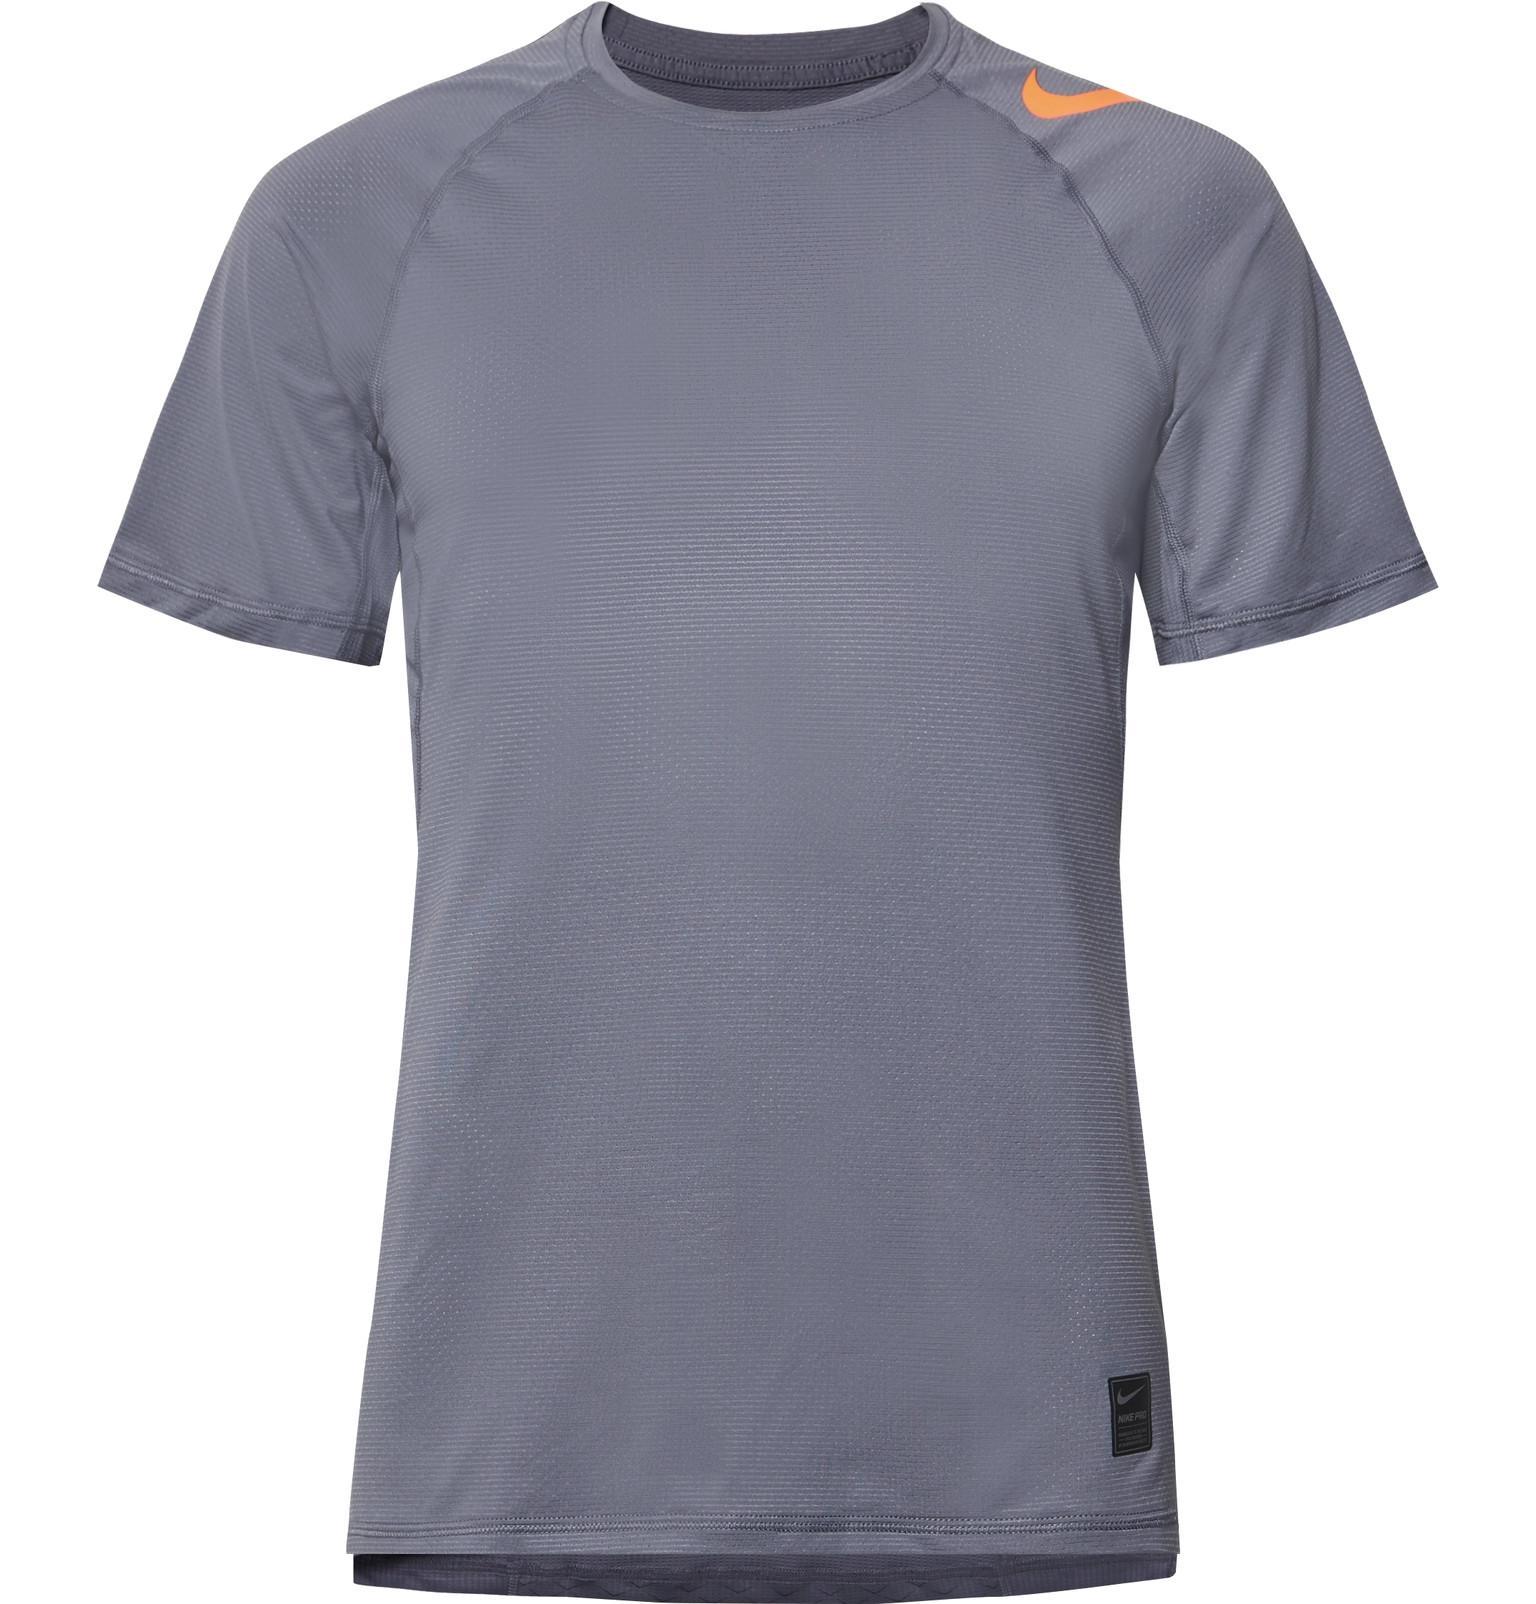 best service 992b7 38539 nike-gray-Pro-Hypercool-Mesh-panelled-Stretch-jersey-T-shirt.jpeg